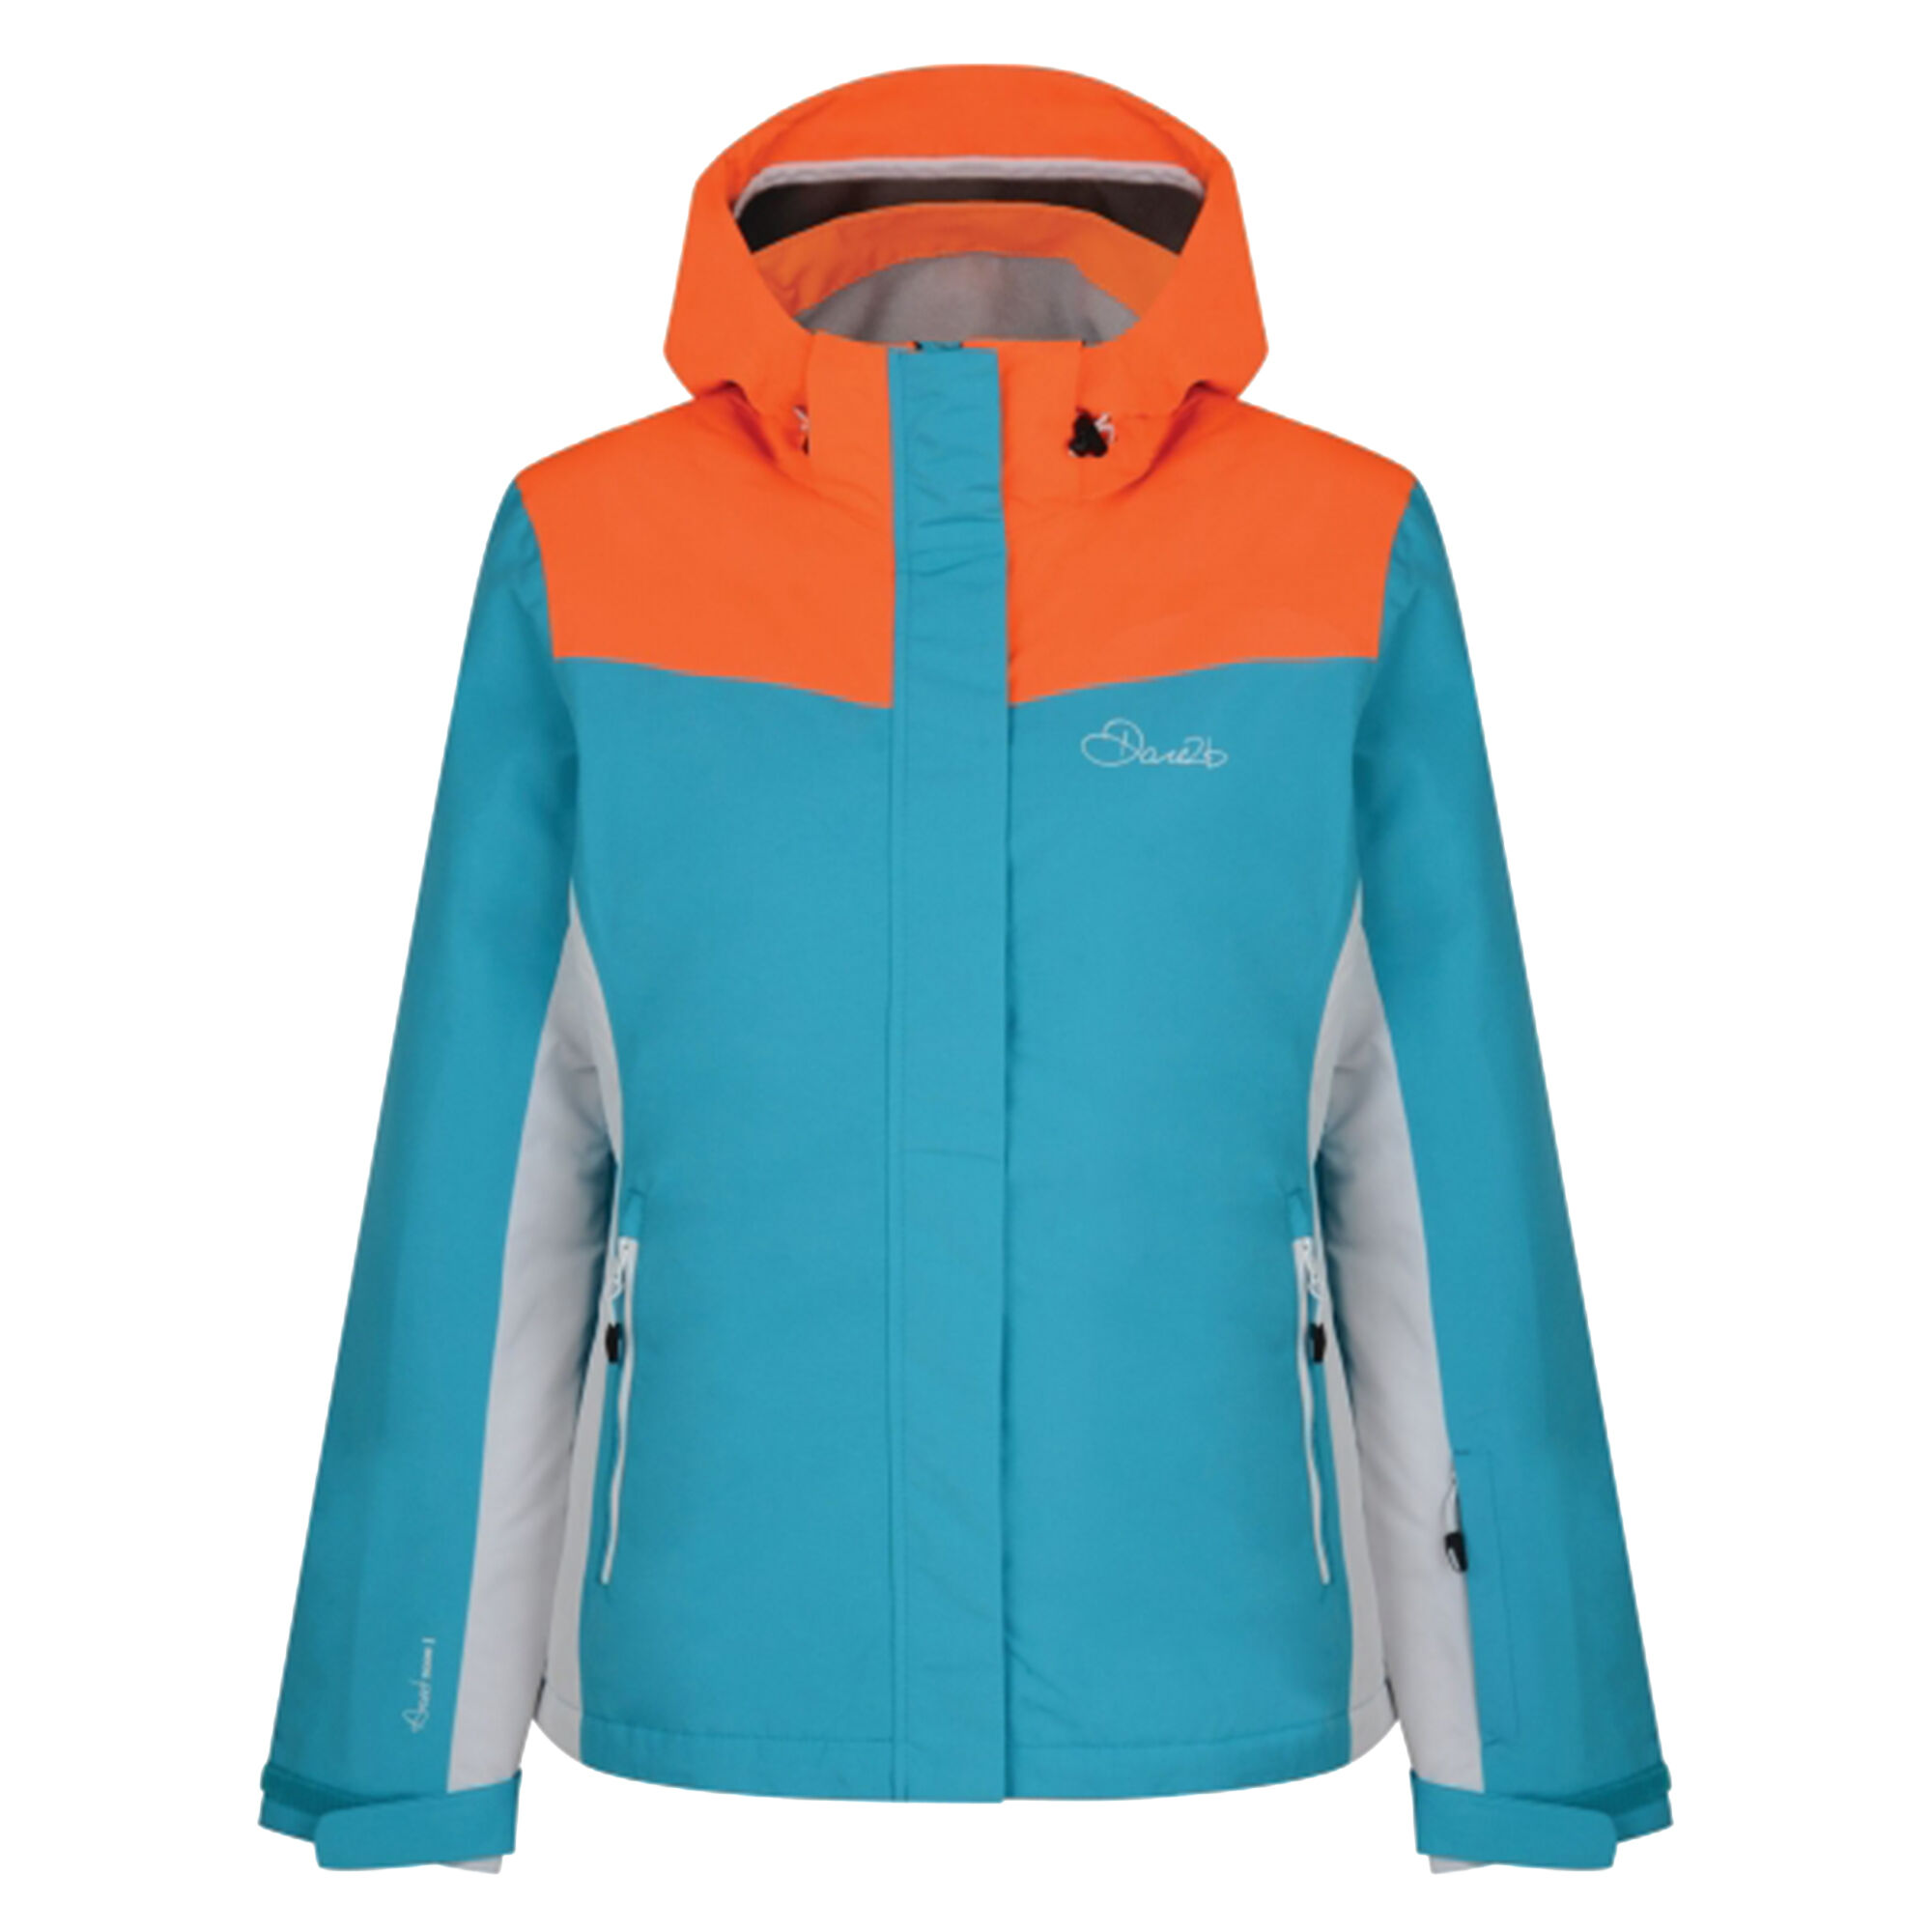 Dare 2B - Manteau De Ski Prosperity - Femme (Bleu / orange) - UTRG3896